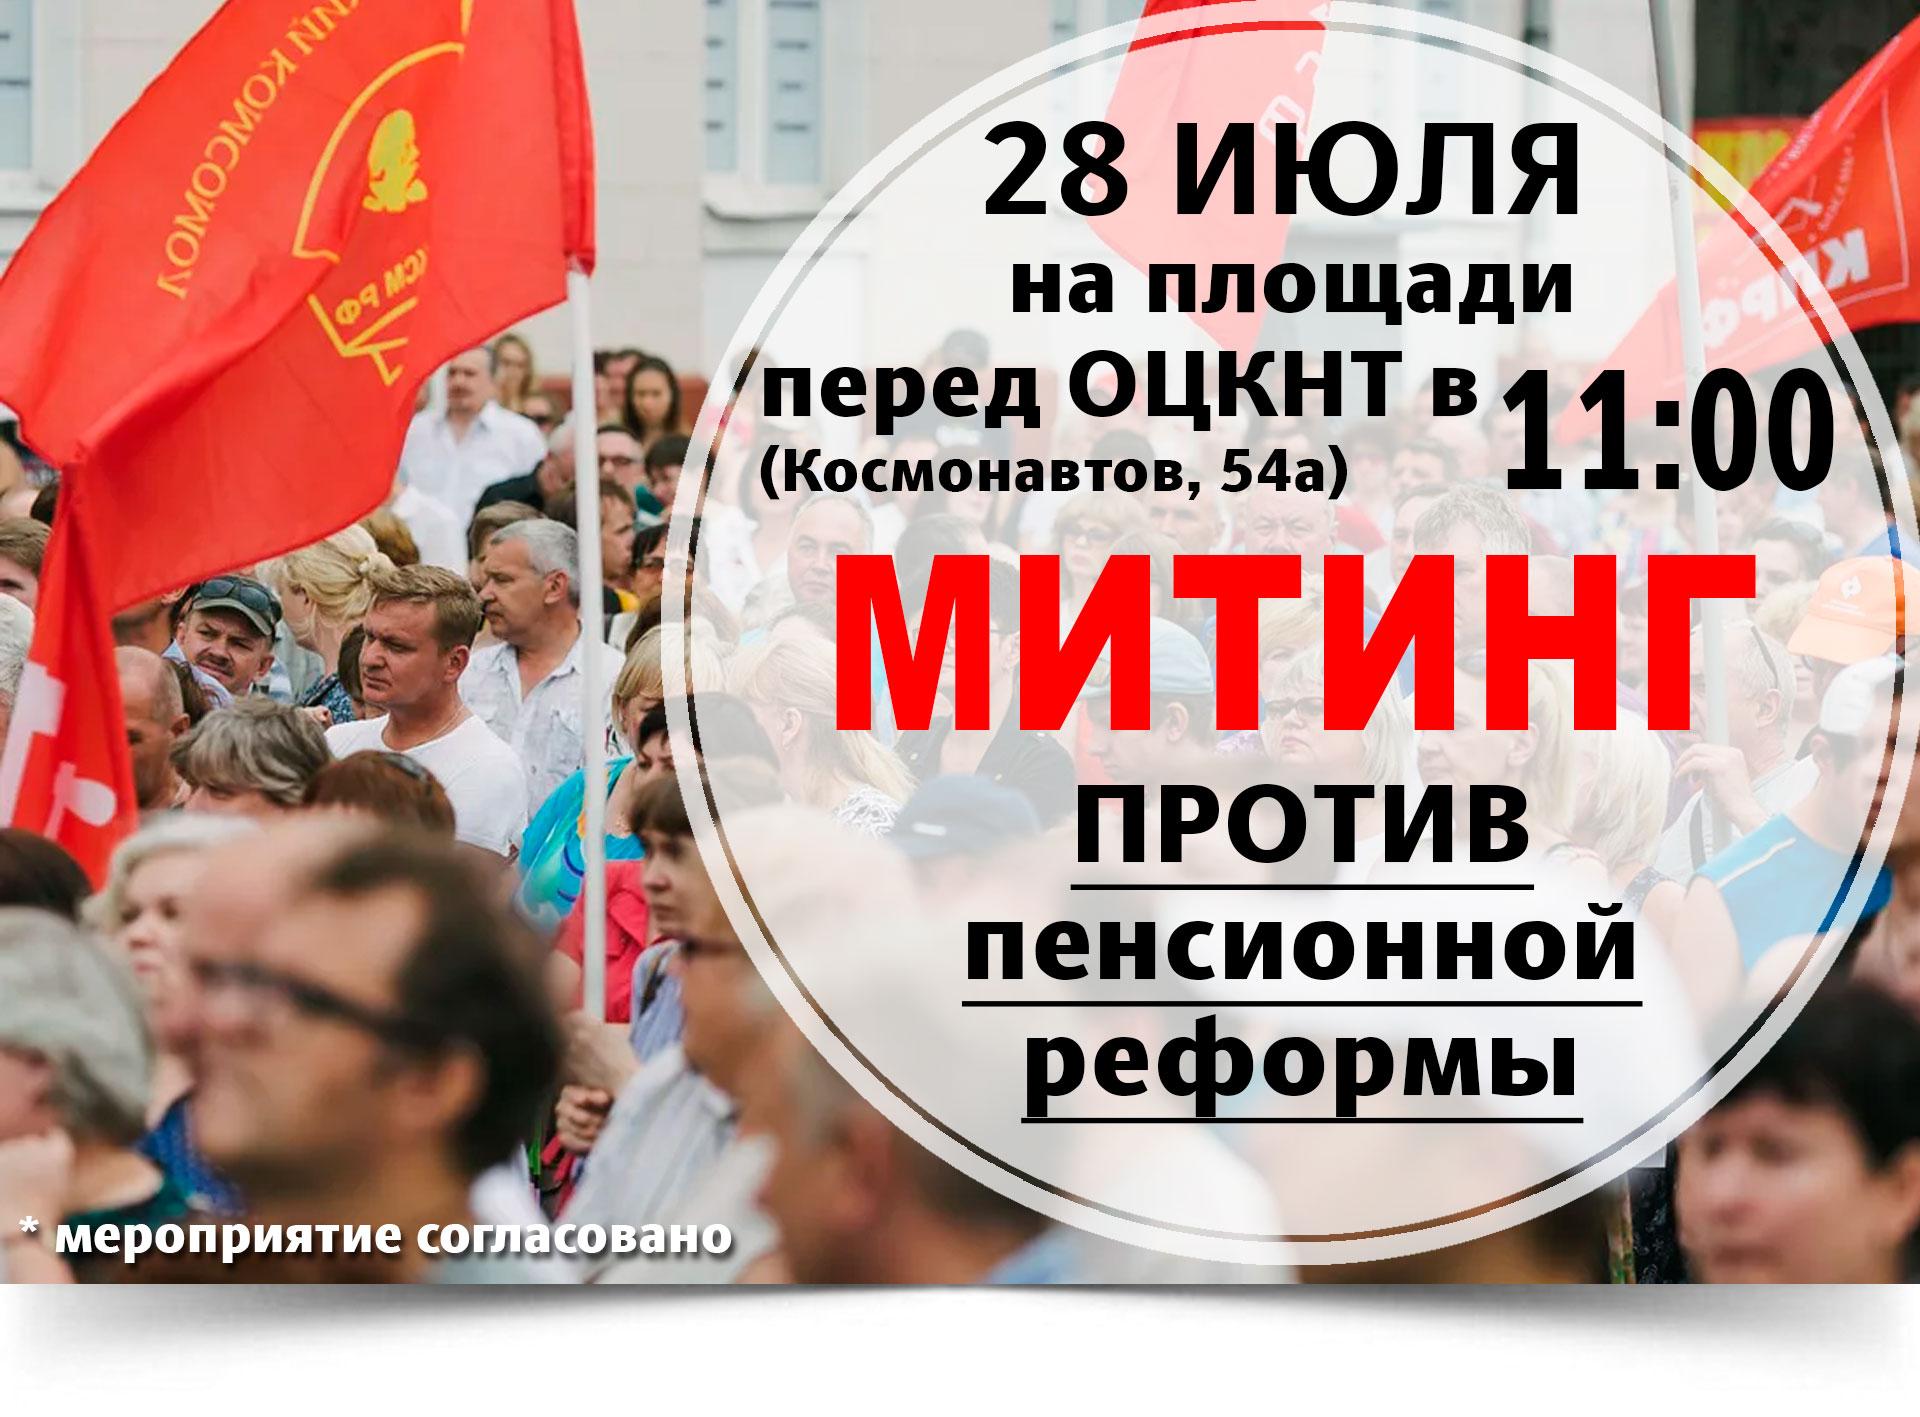 Все на митинг против пенсионного геноцида!